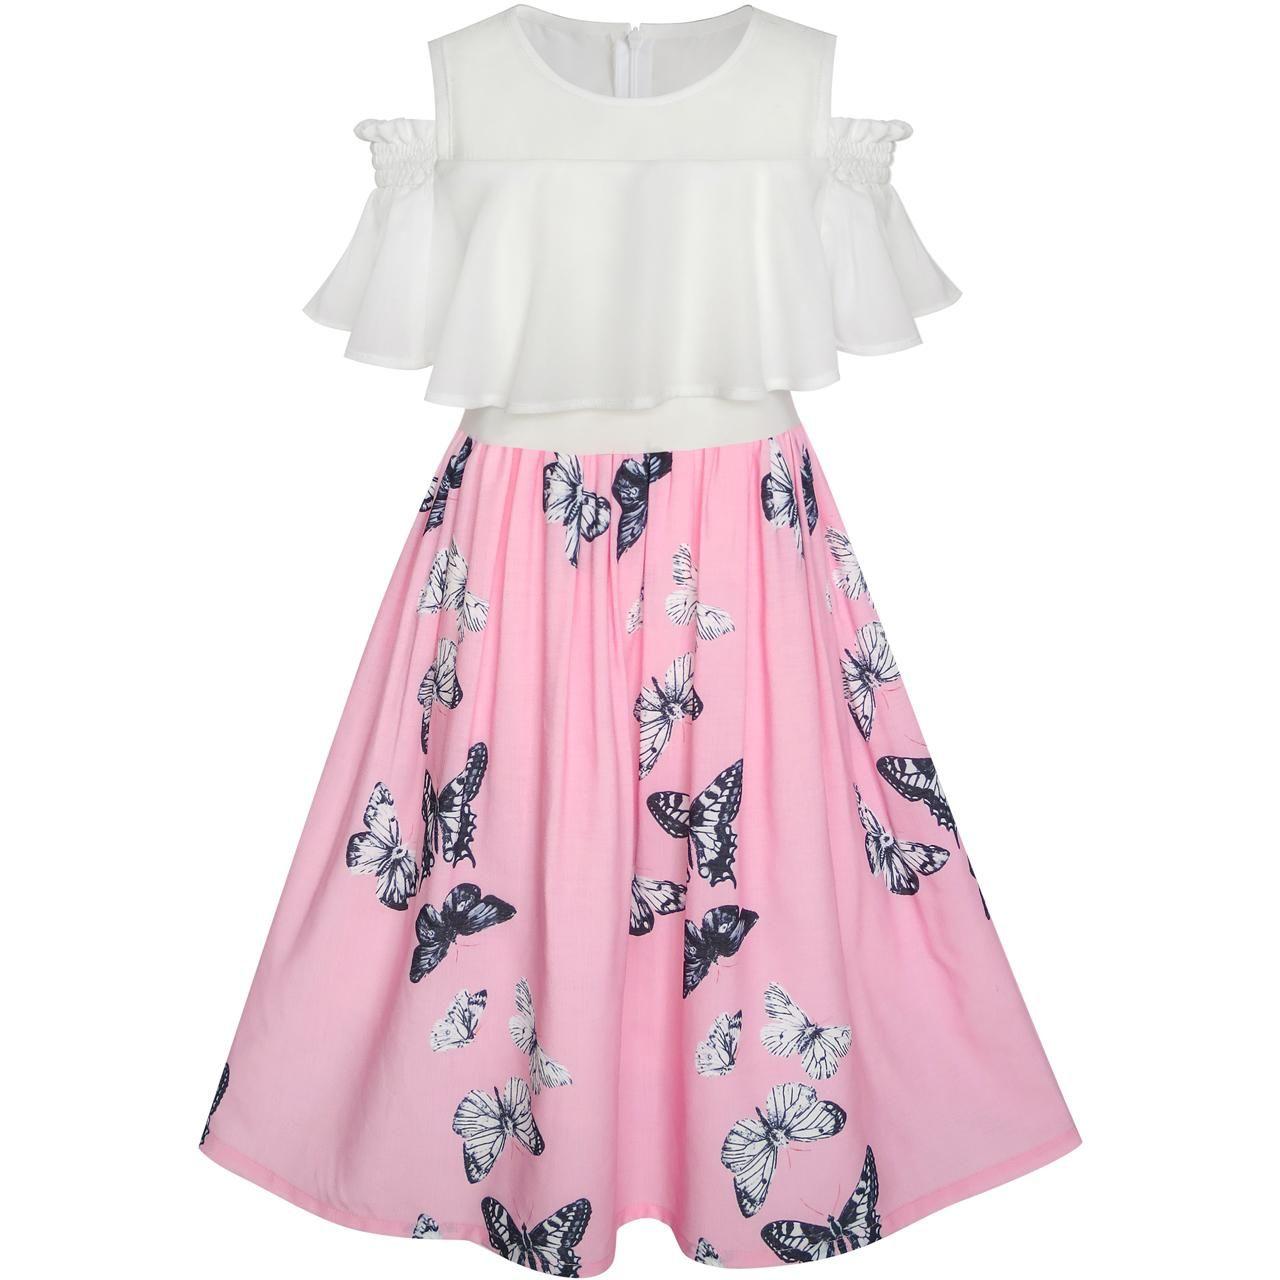 Sunny Fashion Girls Dress Chiffon Butterfly Ruffle Cold shoulder White Pink 2018 Summer Princess Wedding Party Dresses Size 7-14